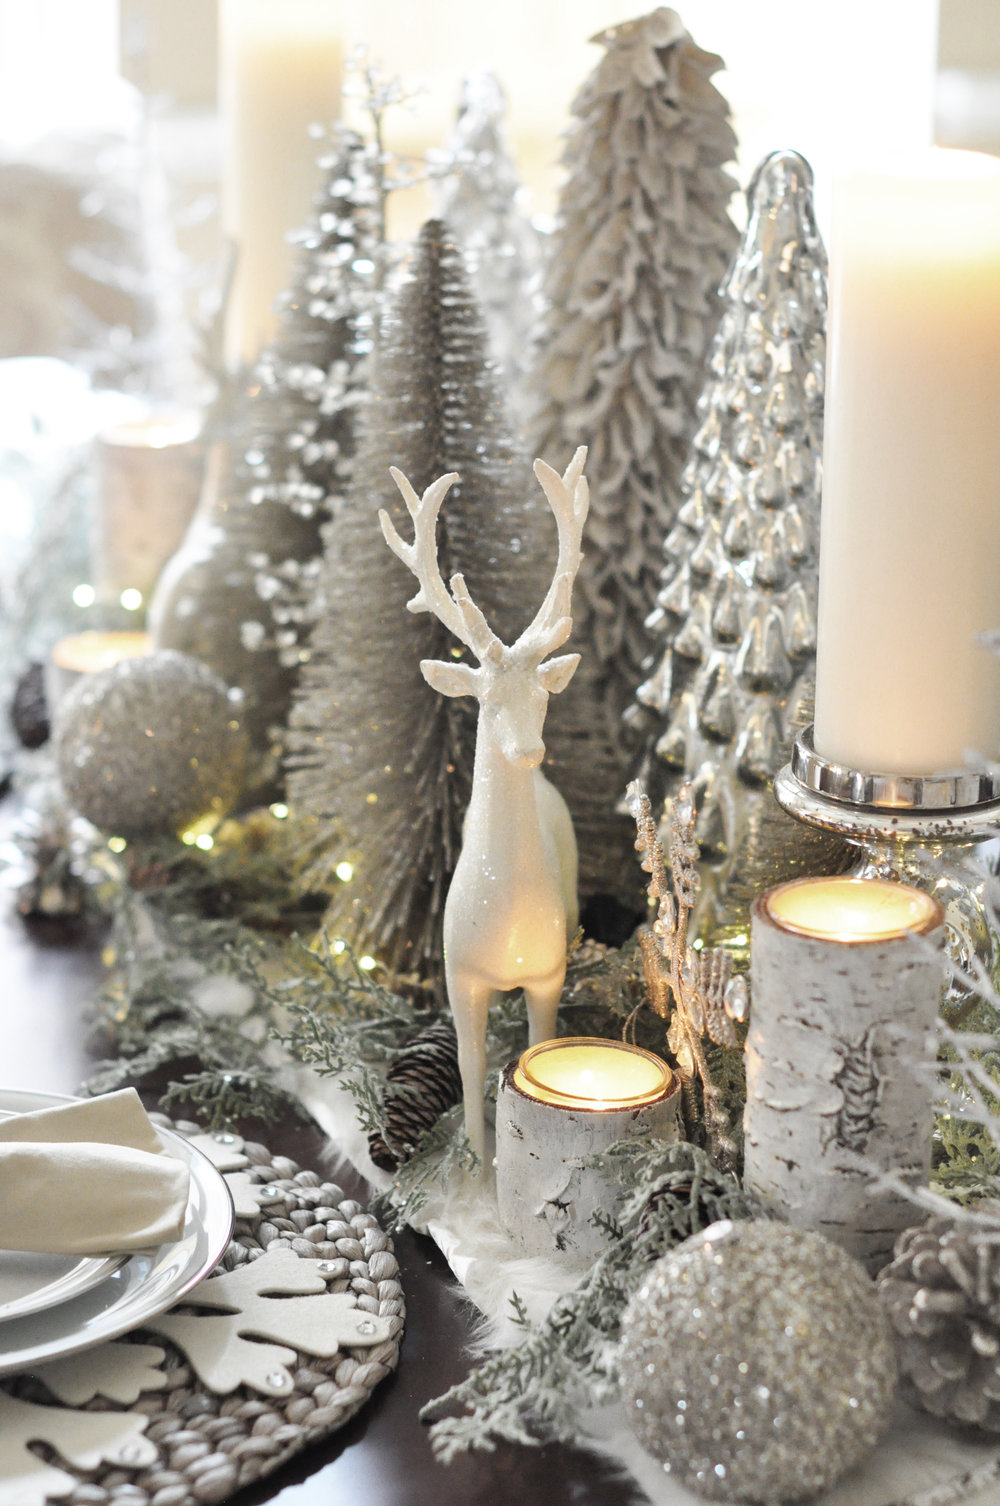 Blog the grace house for Decoration maison jean airoldi